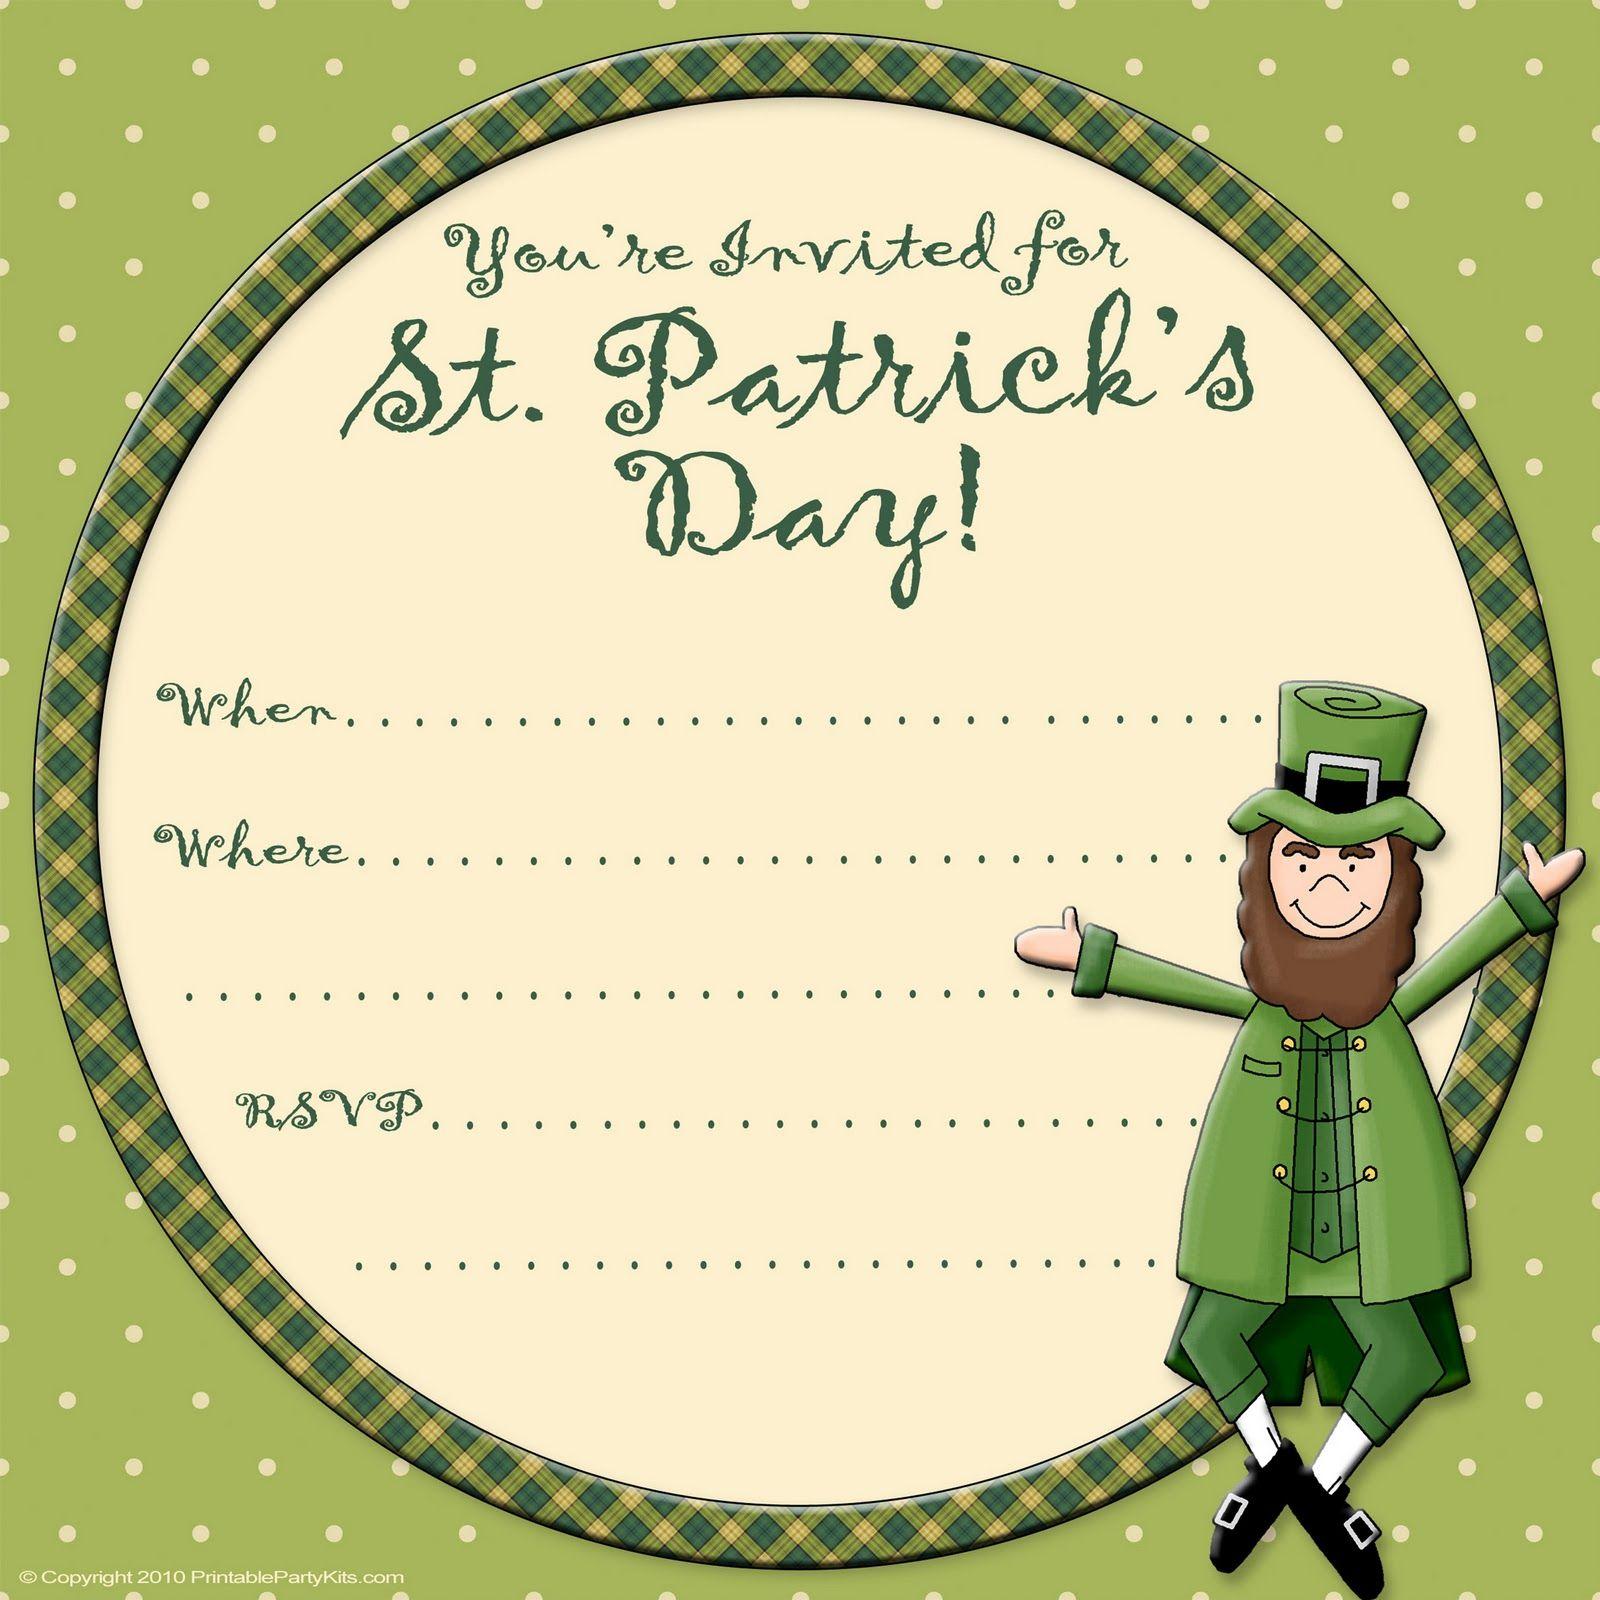 Invitation clipart st patricks day, Invitation st patricks.